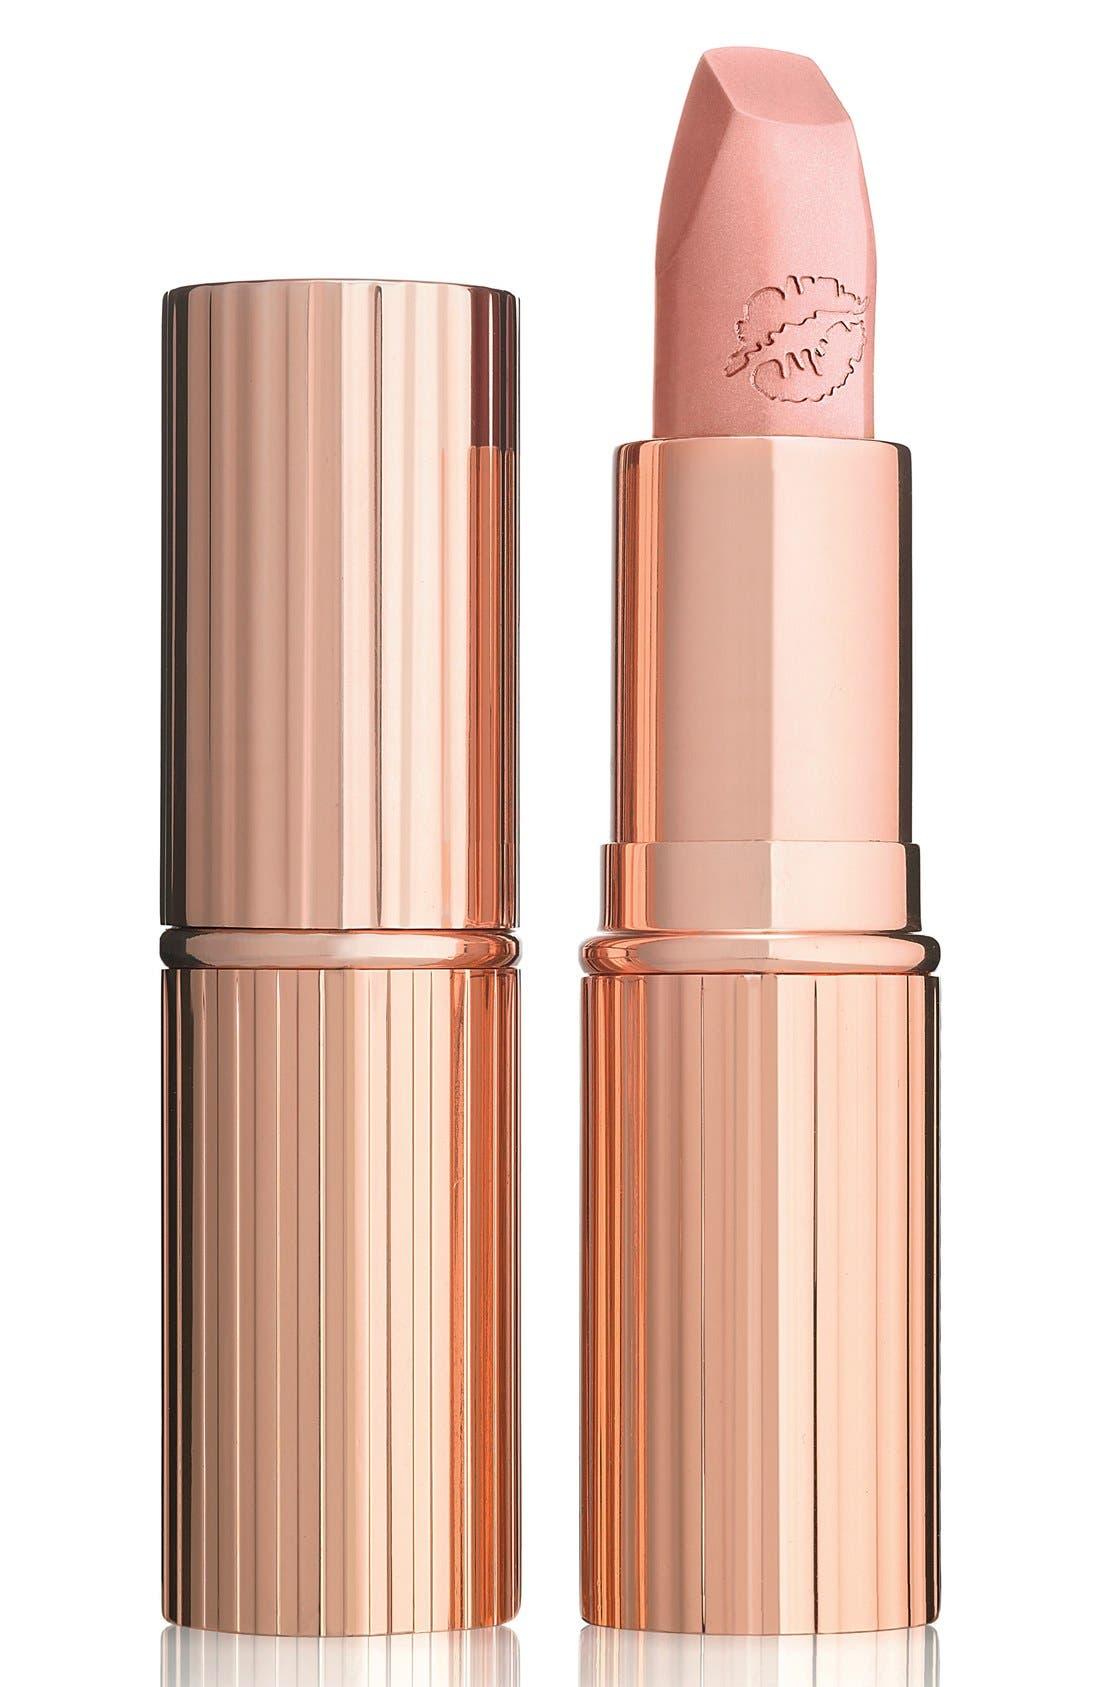 Charlotte Tilbury Hot Lips Lipstick